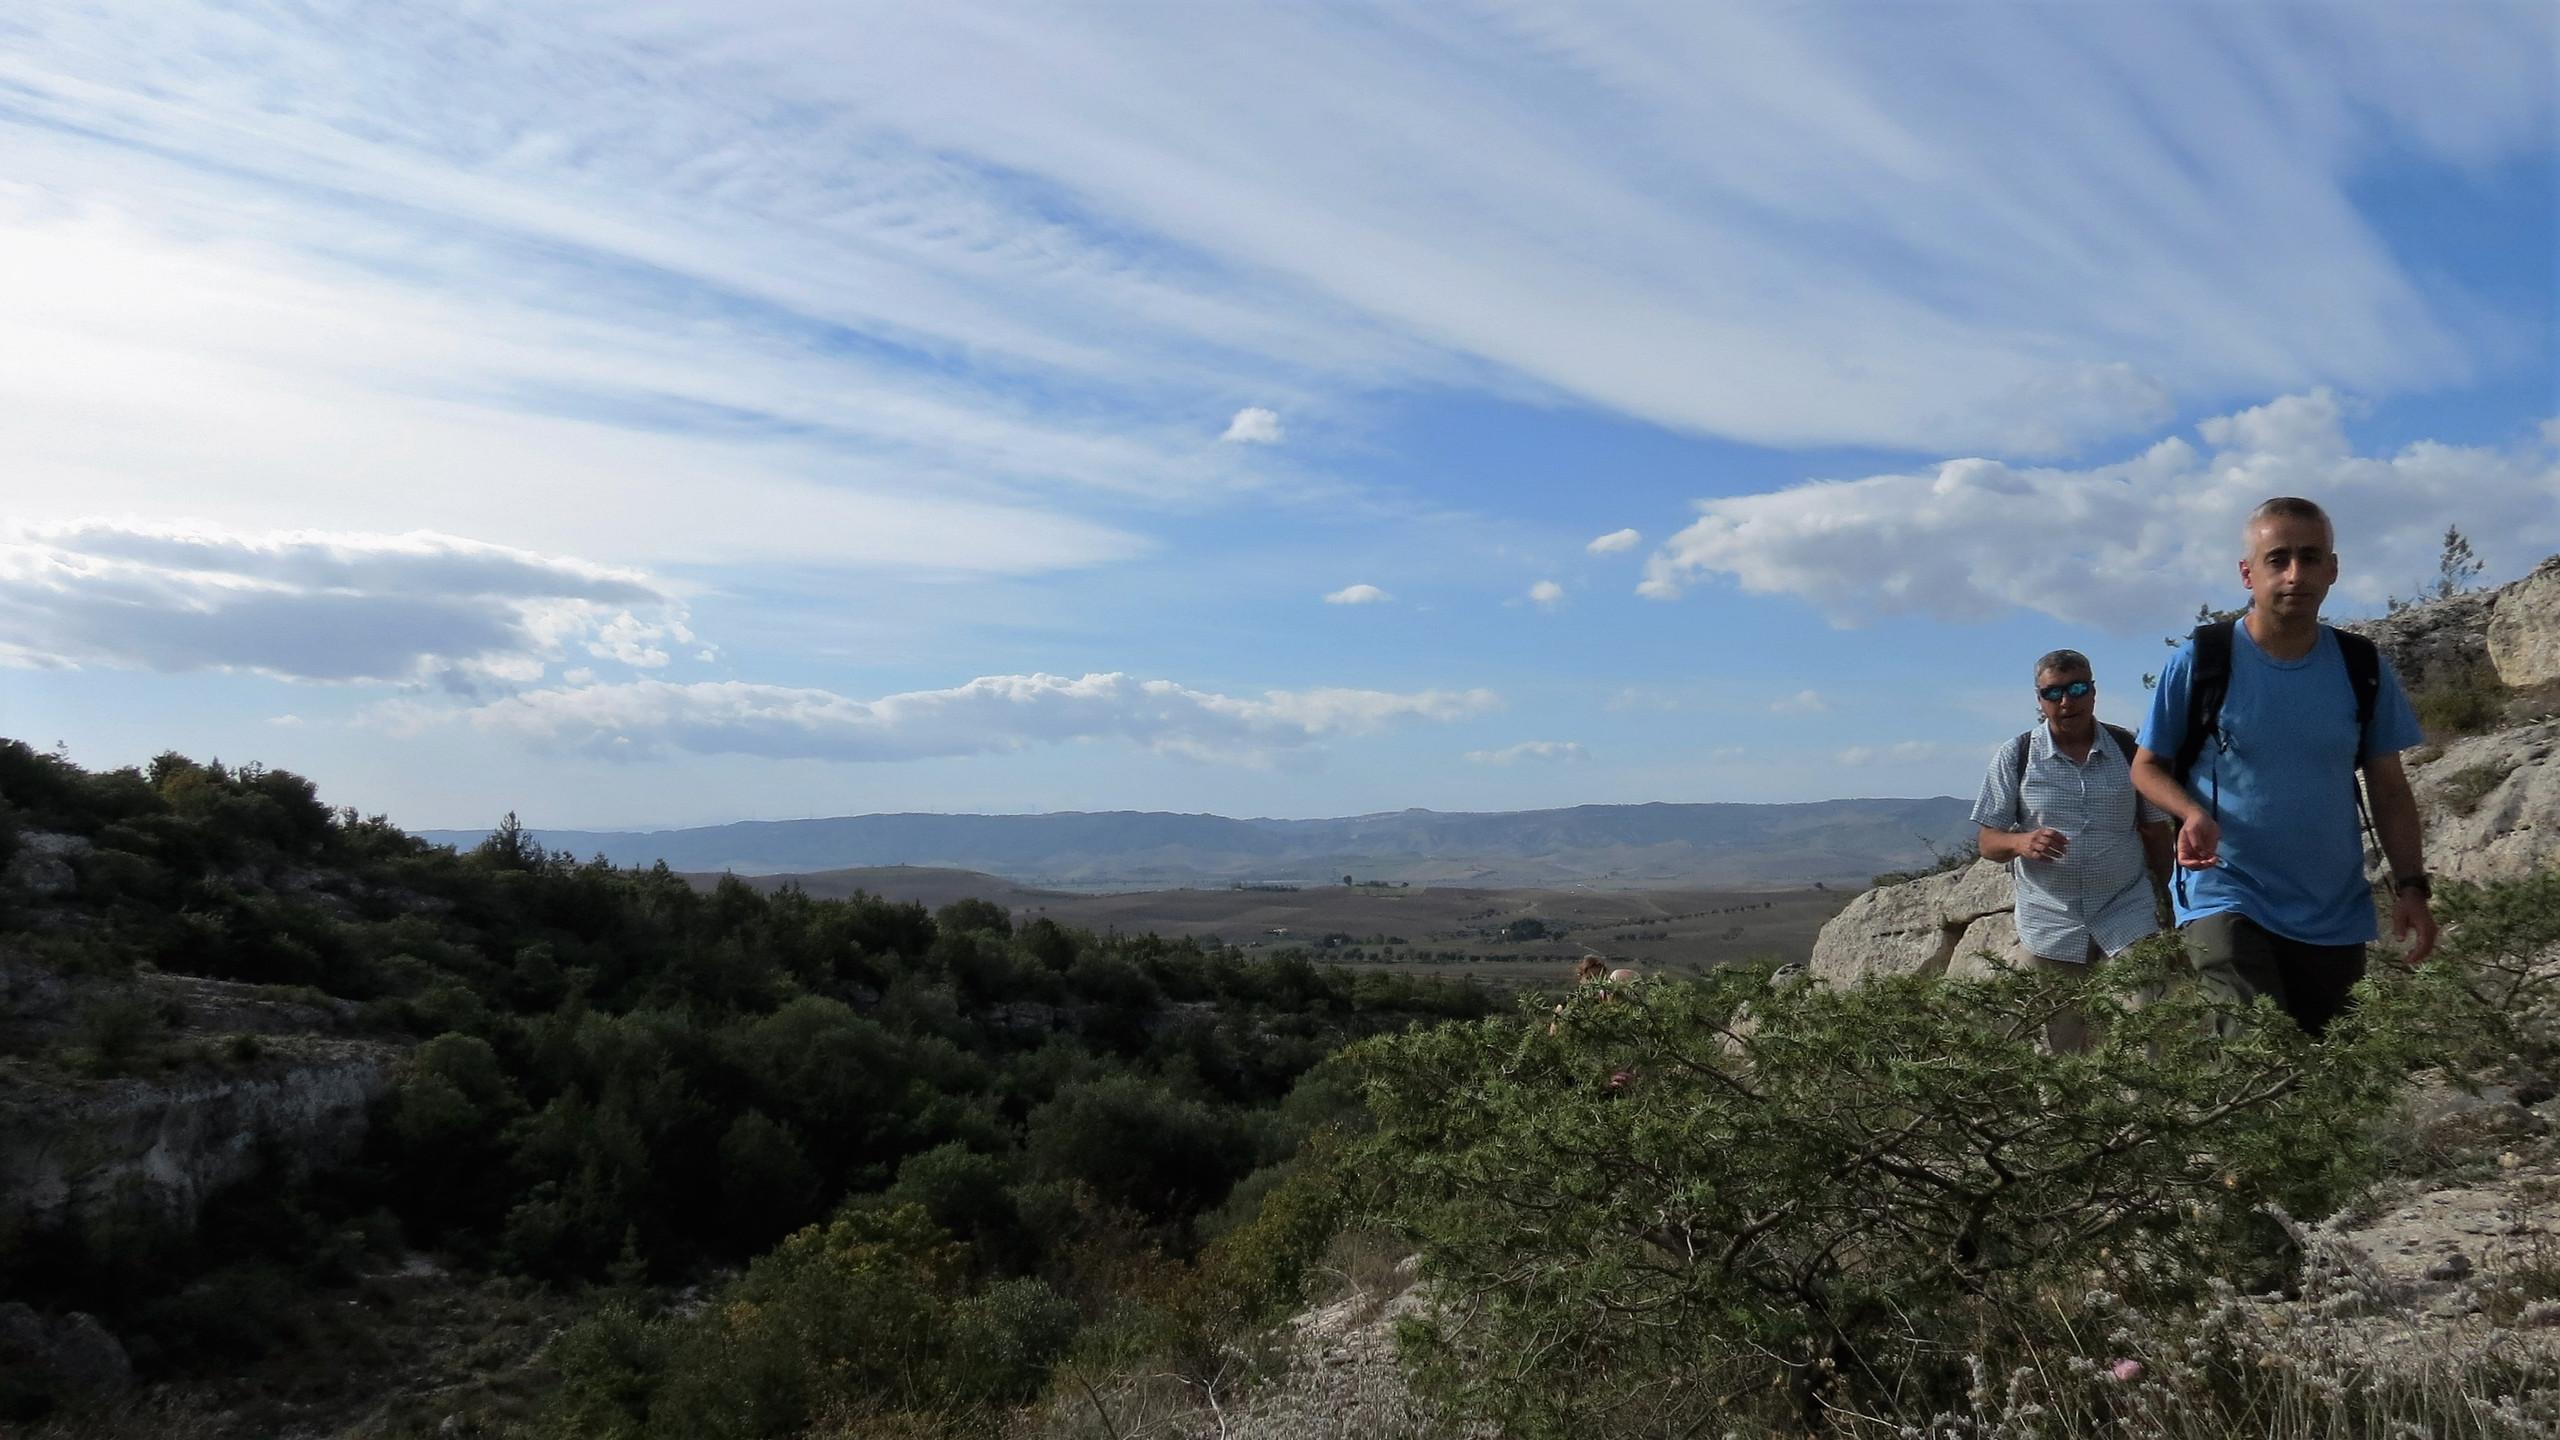 Canyon hike, Matera, Basilicata